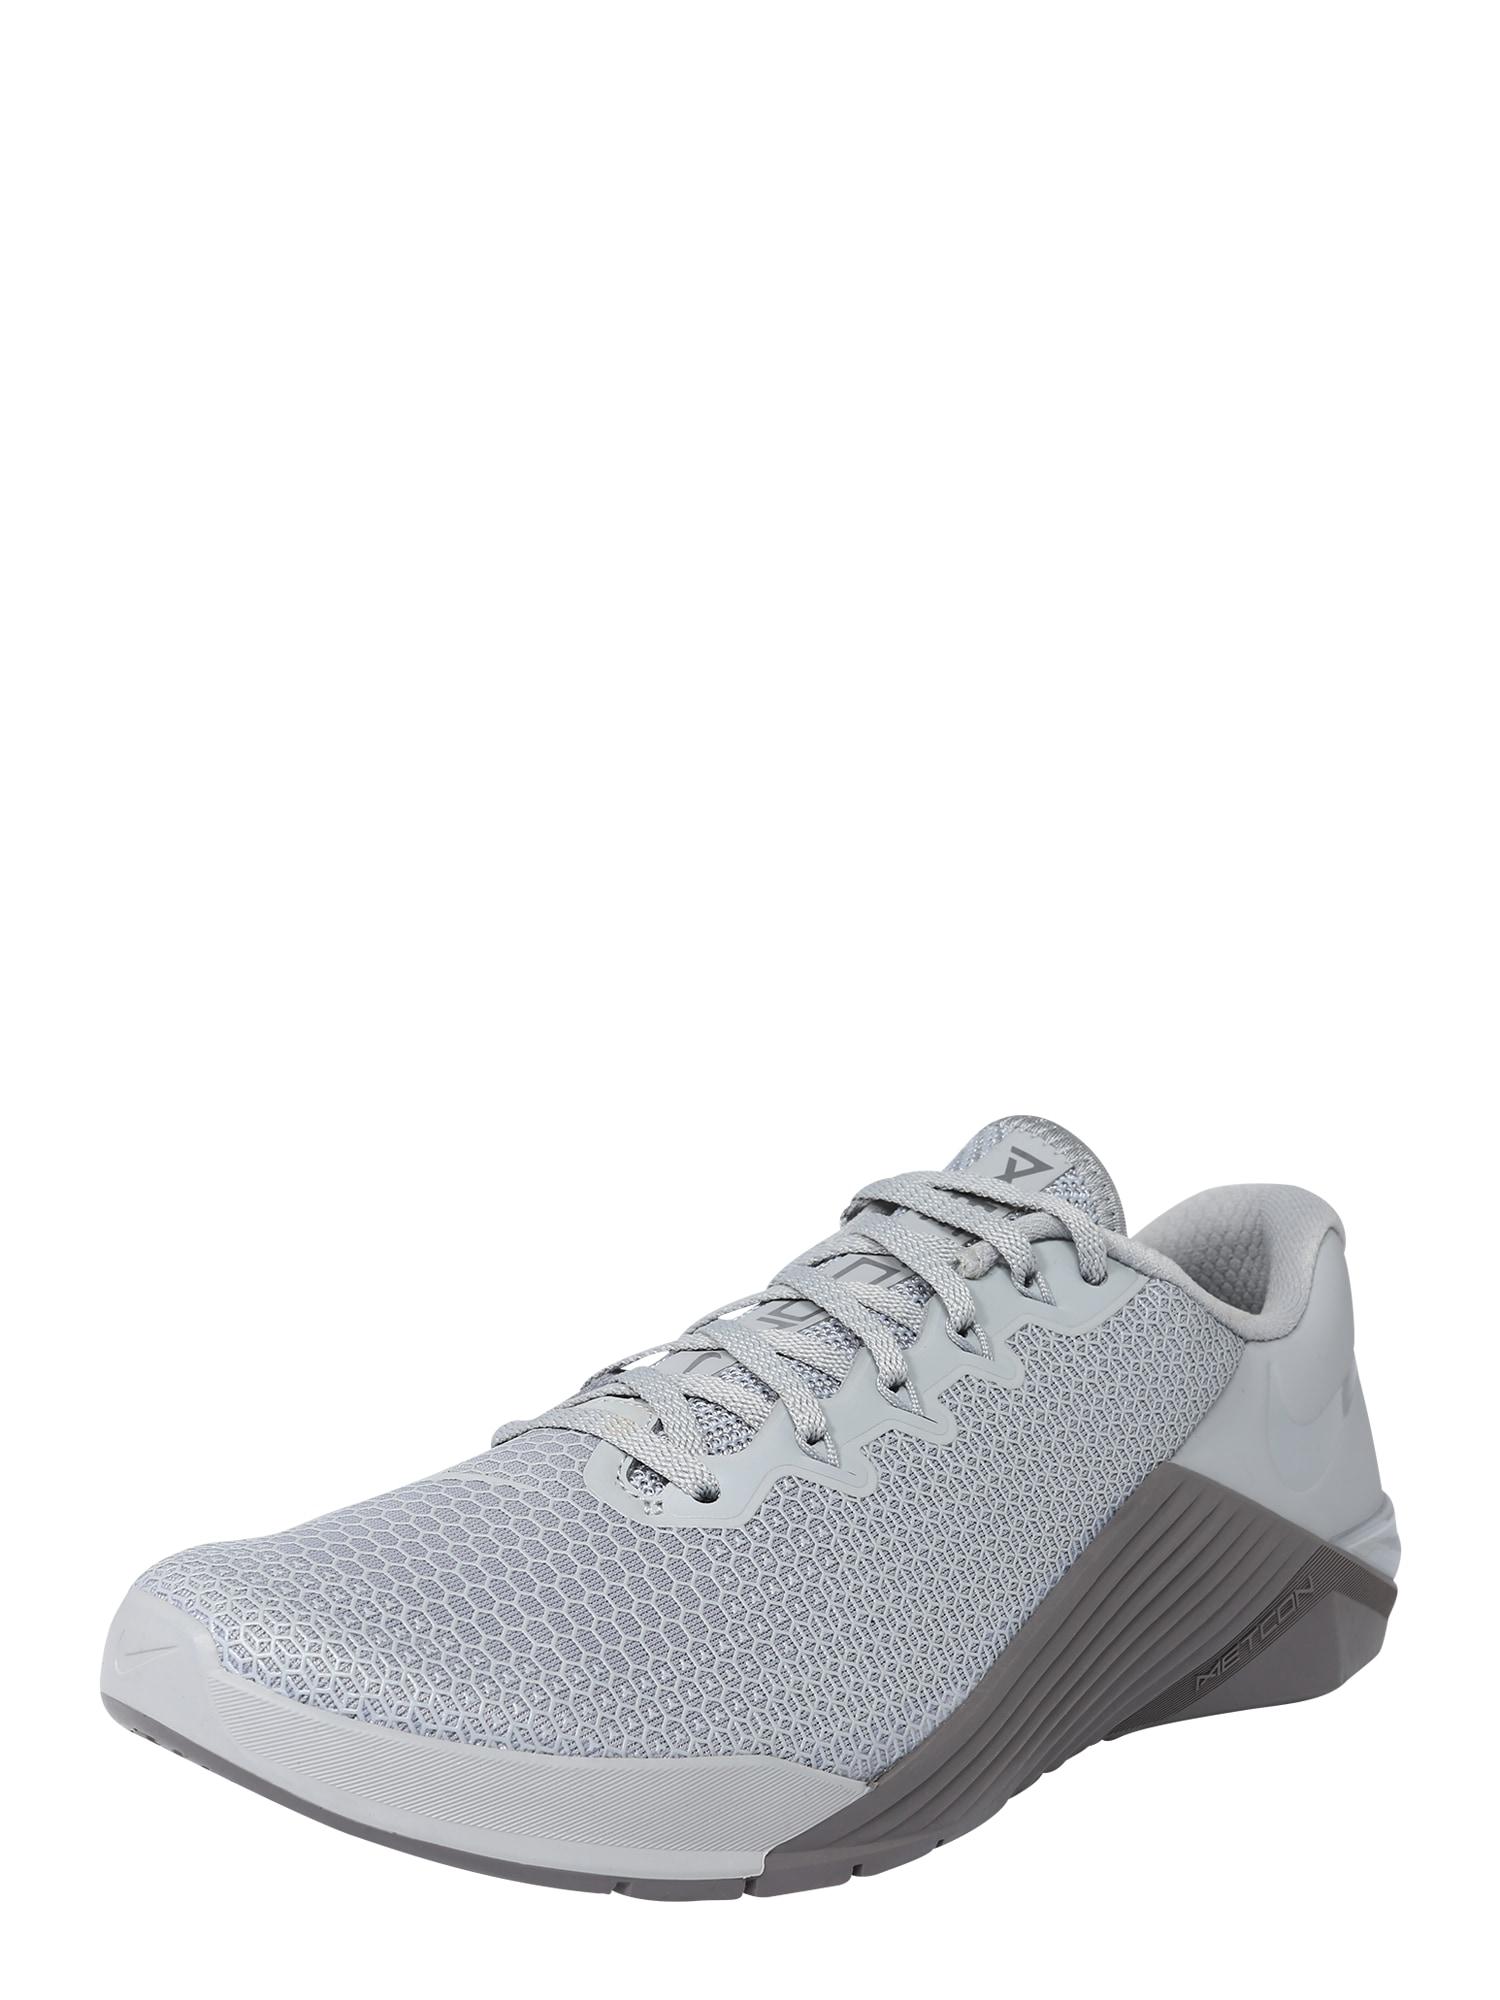 Sportovní boty METCON 5 šedá NIKE